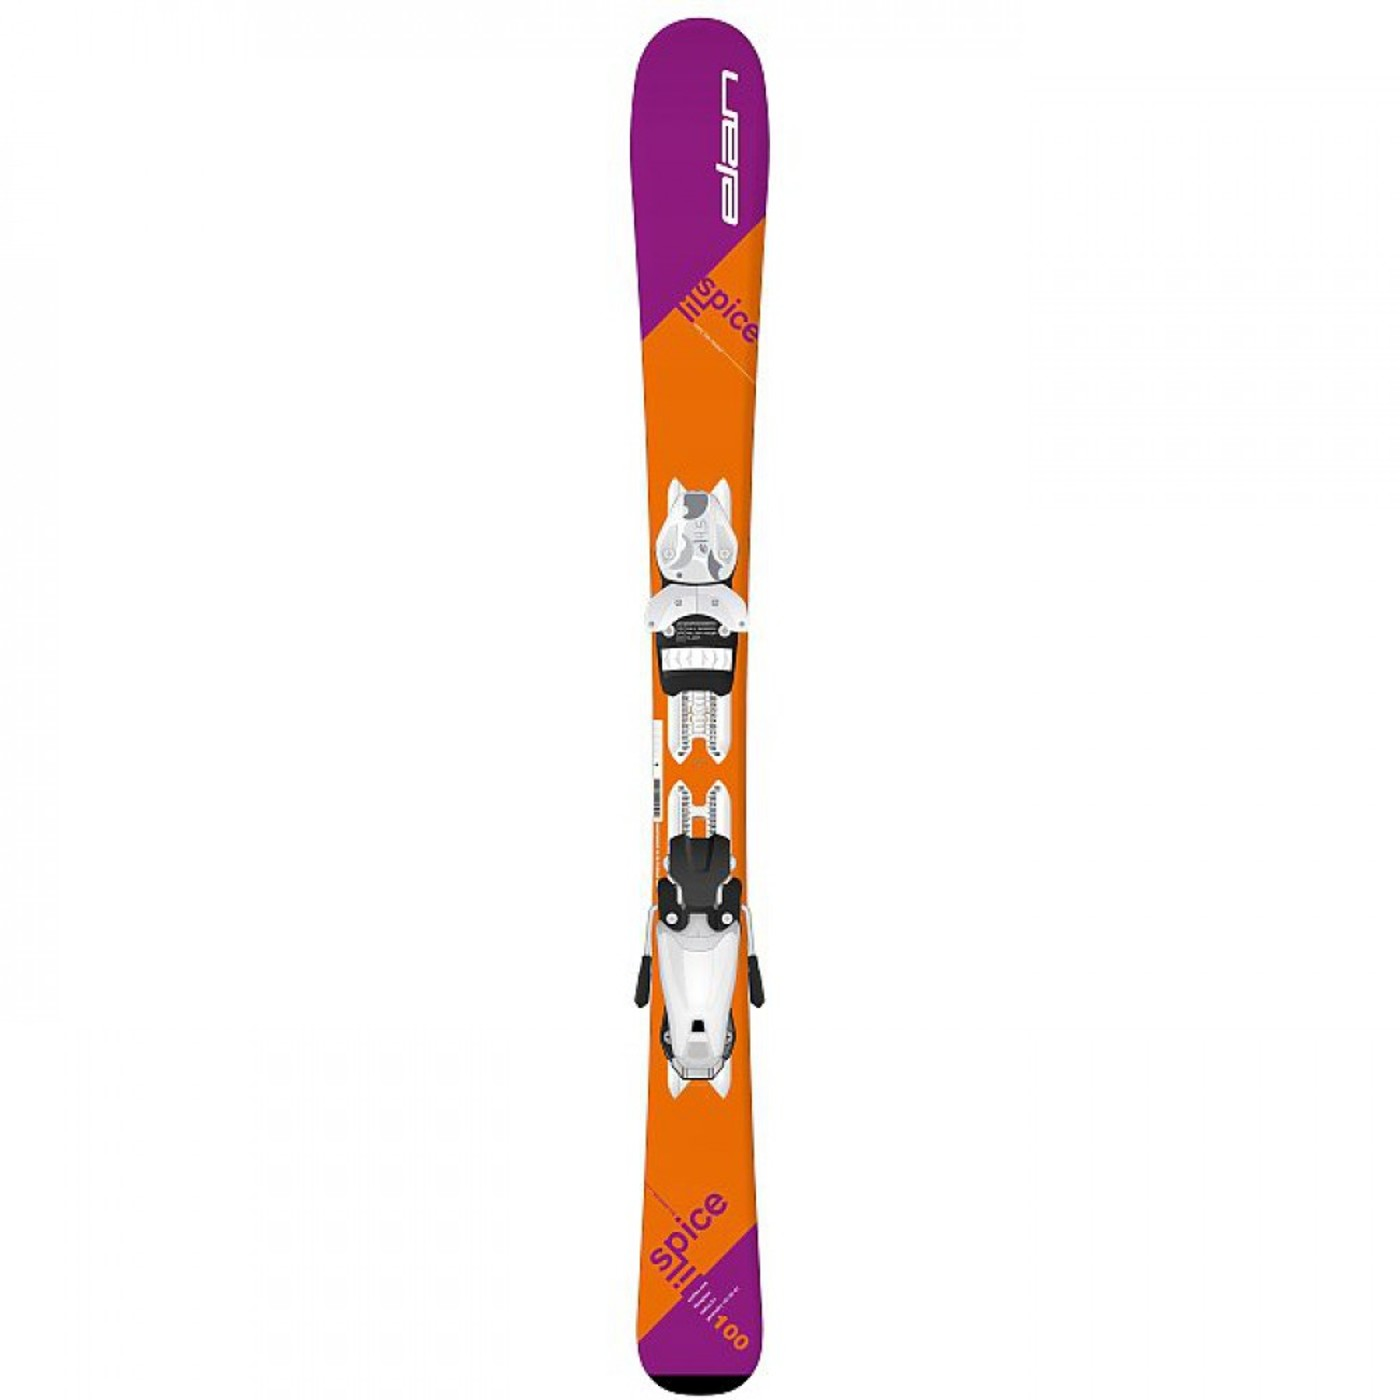 ELAN Ski-Set LIL SPICE EL4.5/7.5 Jr